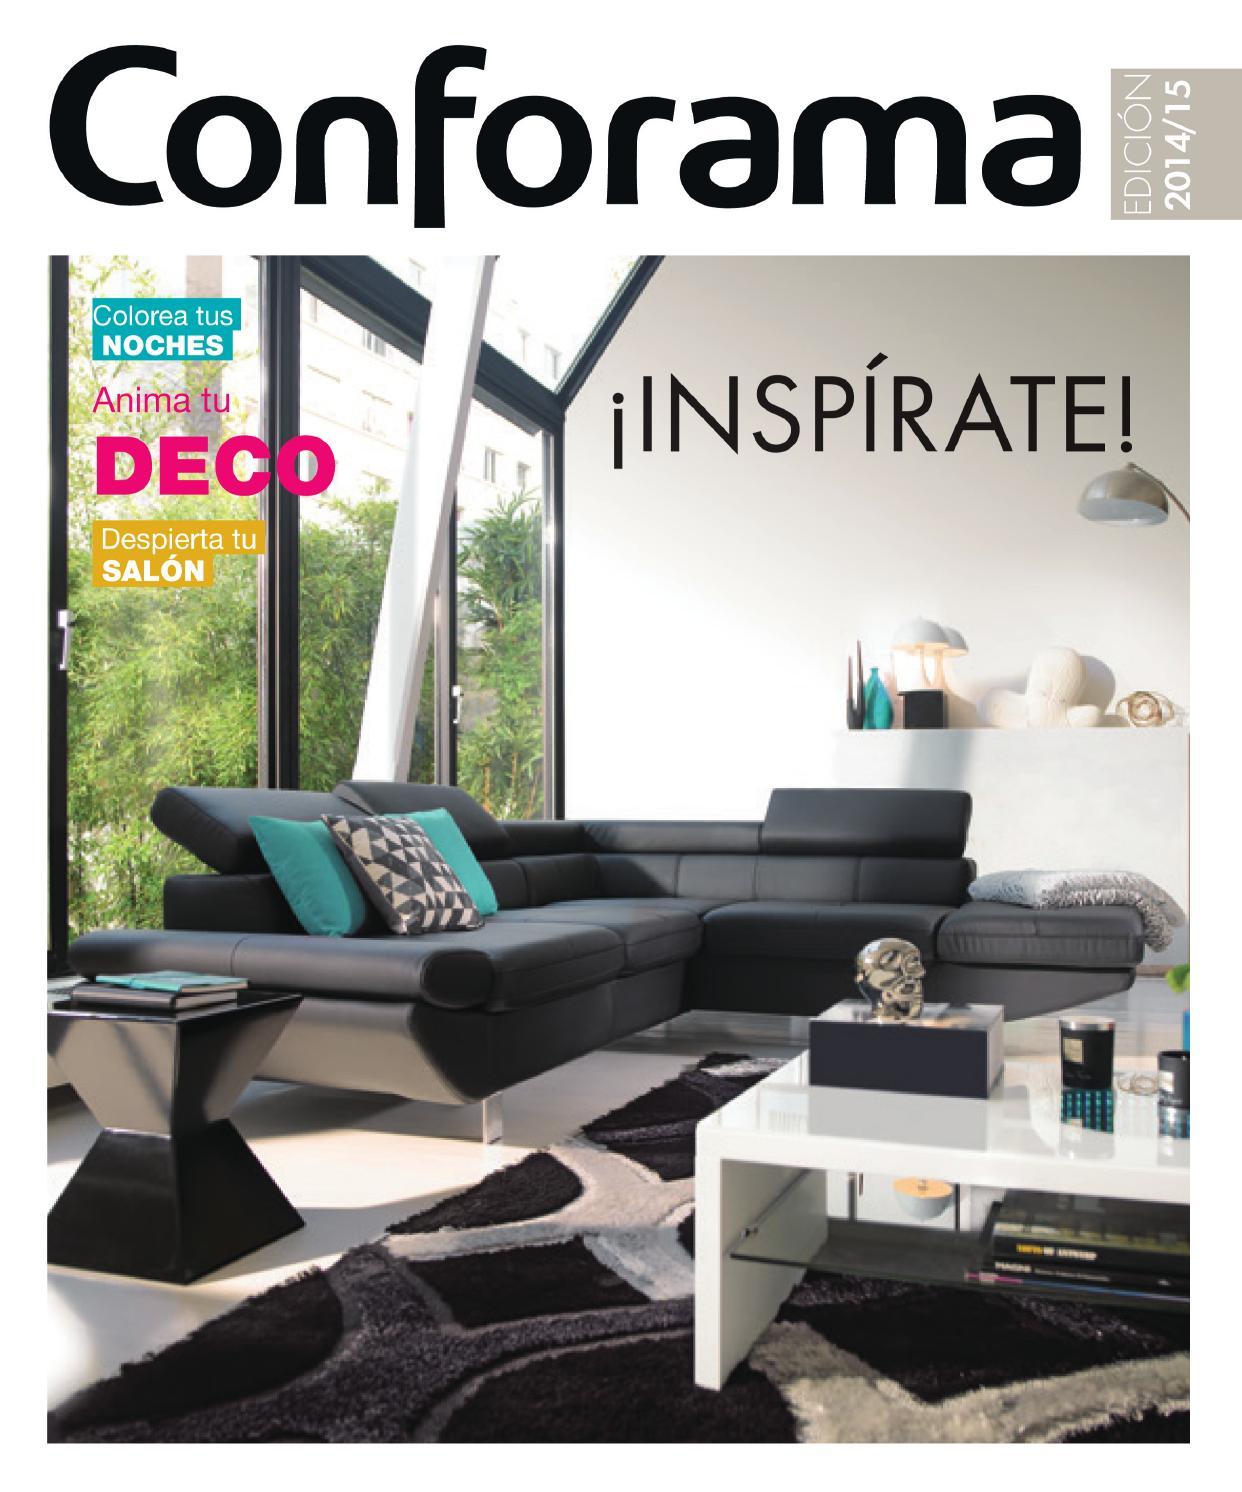 Conforama catalogo anual 2014 15 by losdescuentos issuu - Catalogo de conforama ...